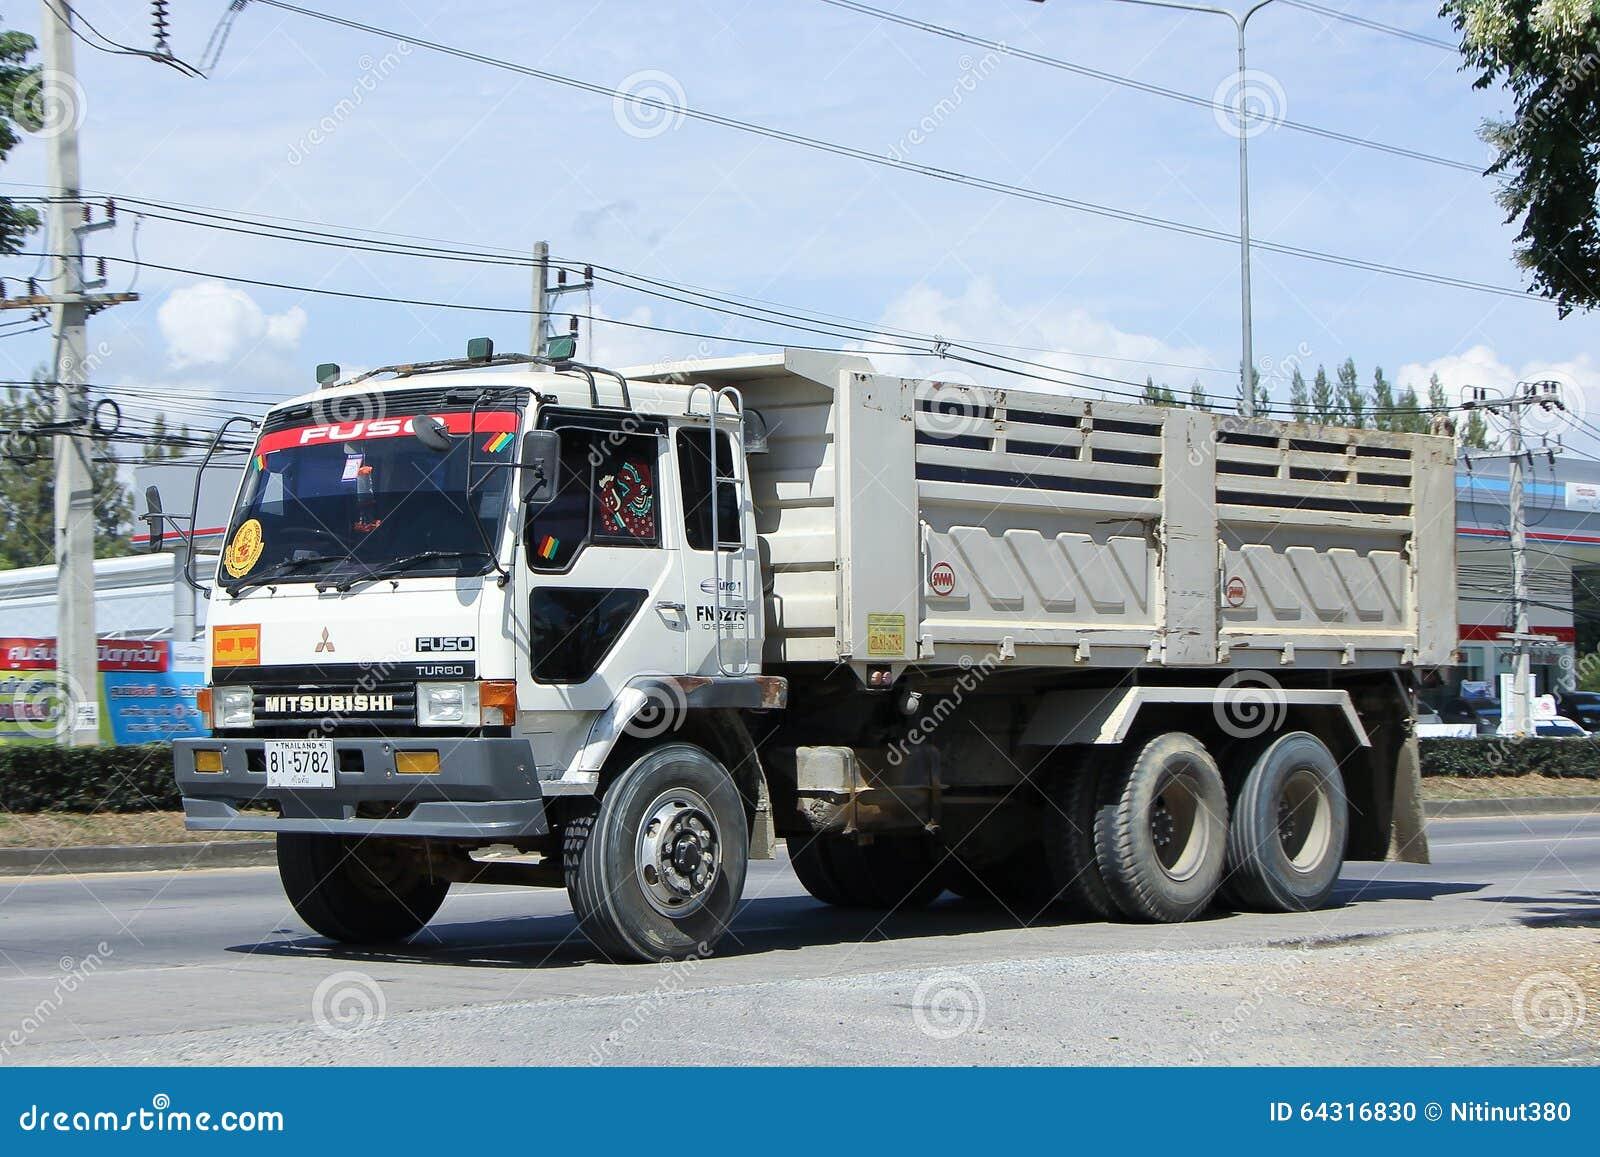 Old Mitsubishi 10 Wheel Dump Truck Editorial Image - Image of ...